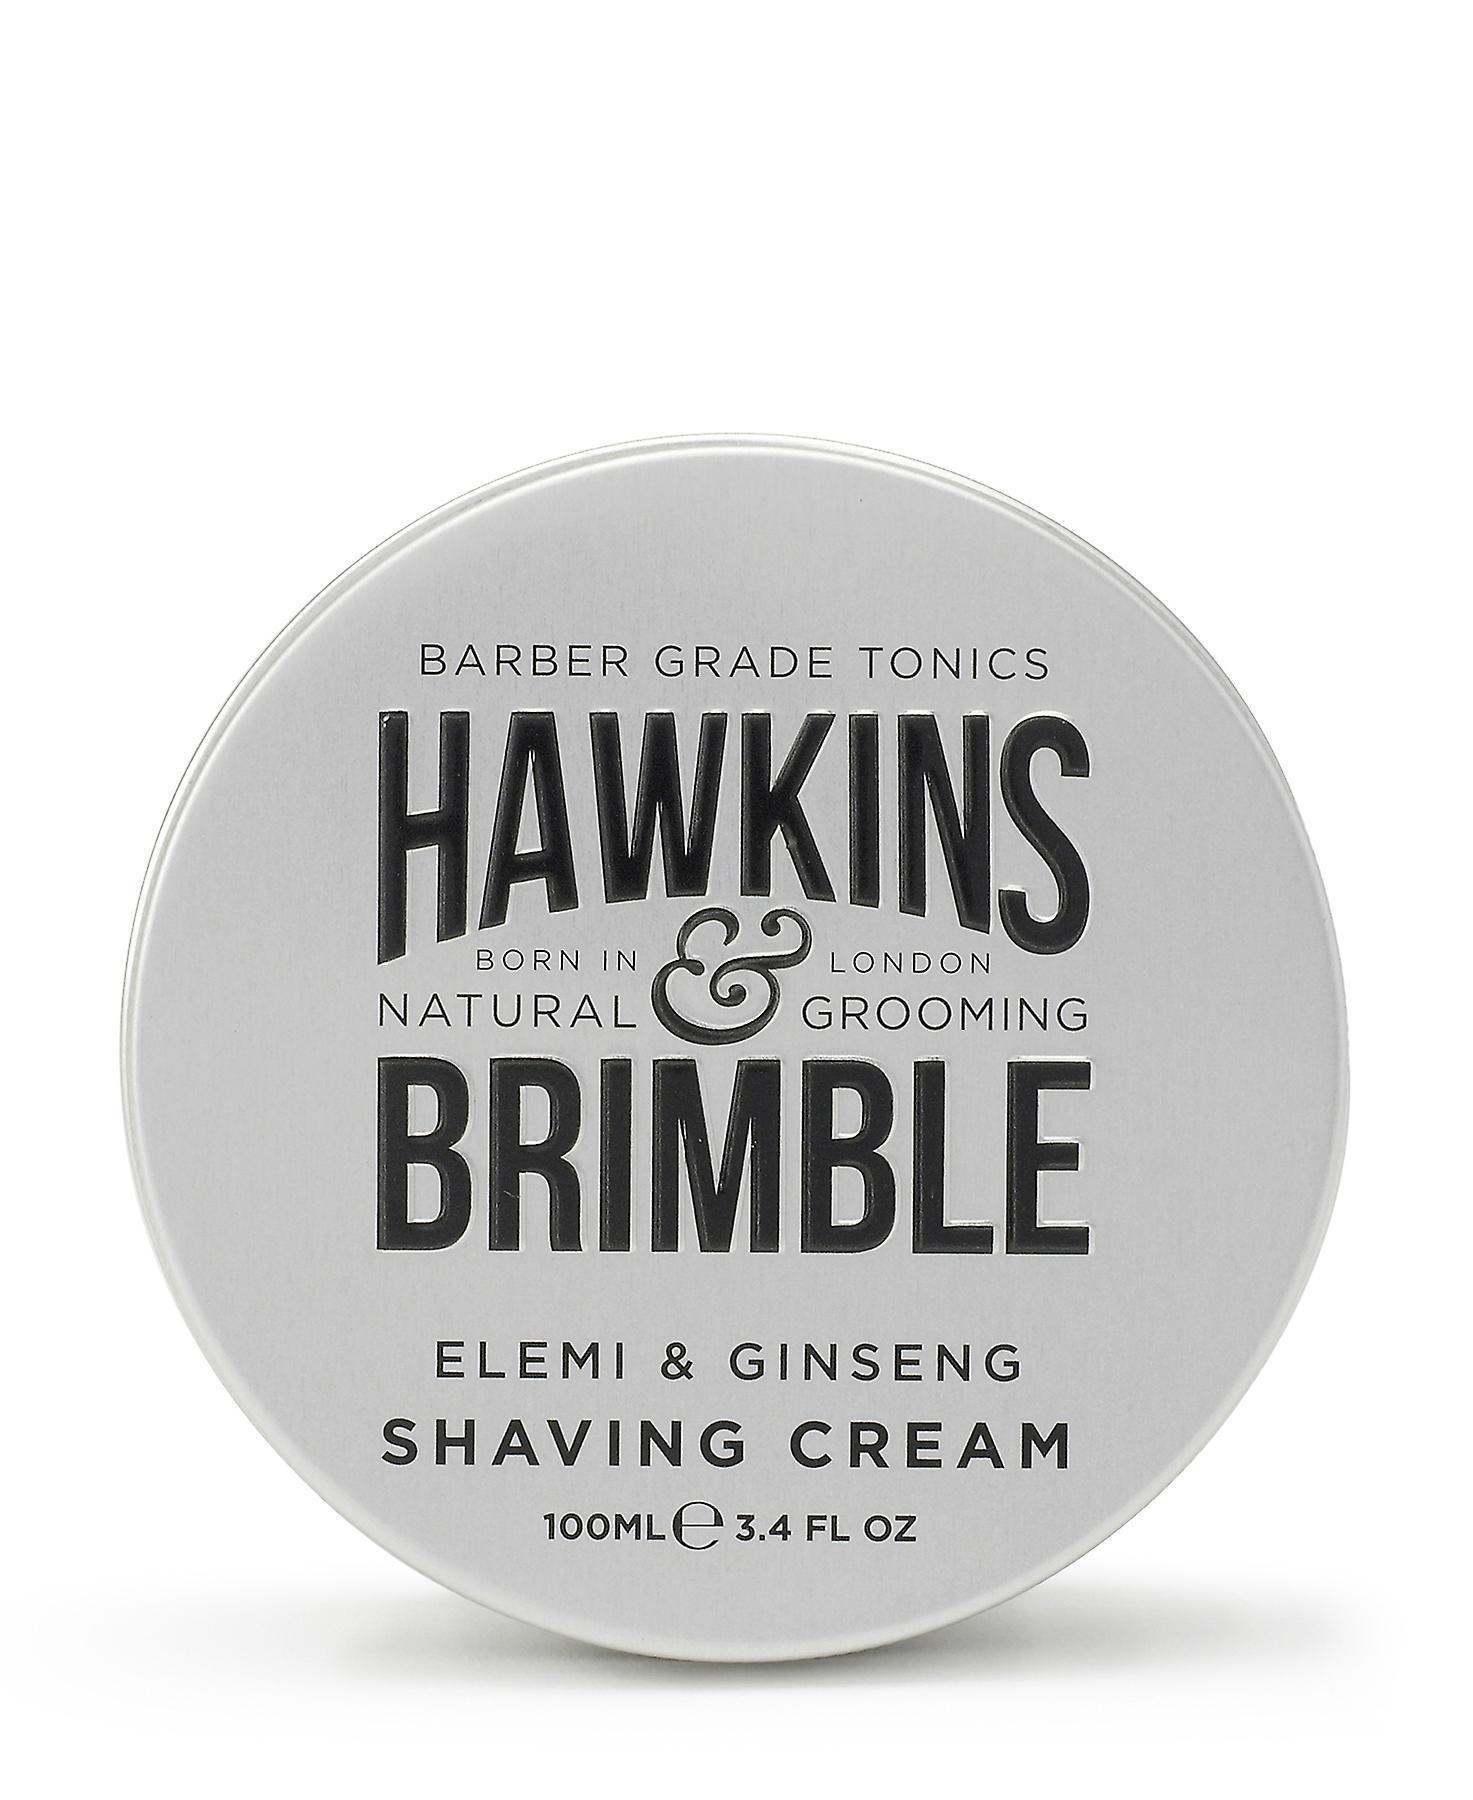 Hawkins & Brimble Shaving Cream (100ml)